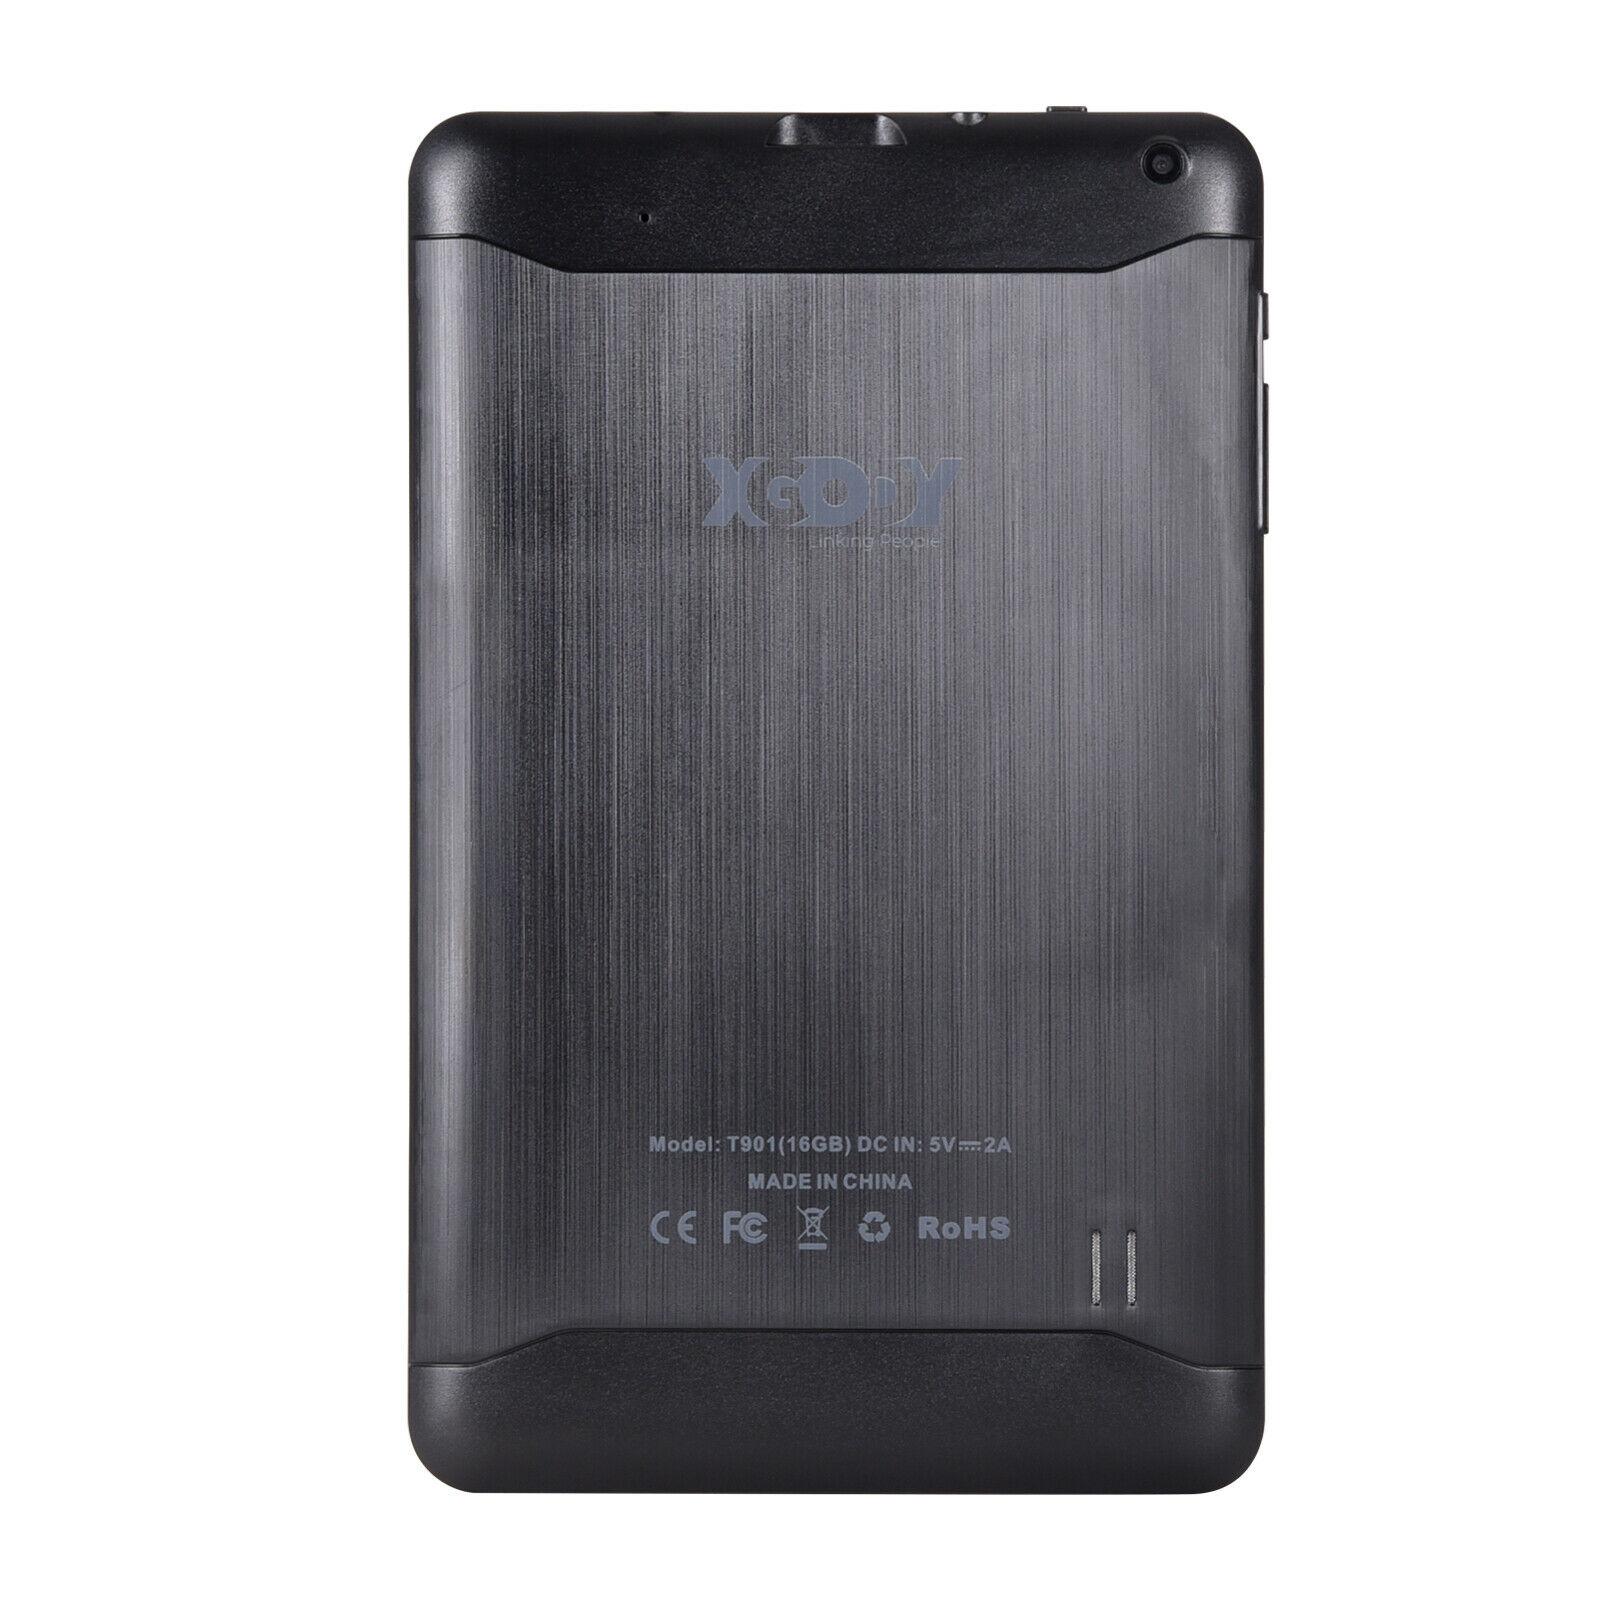 XGODY-10-1-Inch-Android-7-0-1-16GB-Quad-Core-Tablet-PC-Dual-Camera-HD-Bluetooth thumbnail 11